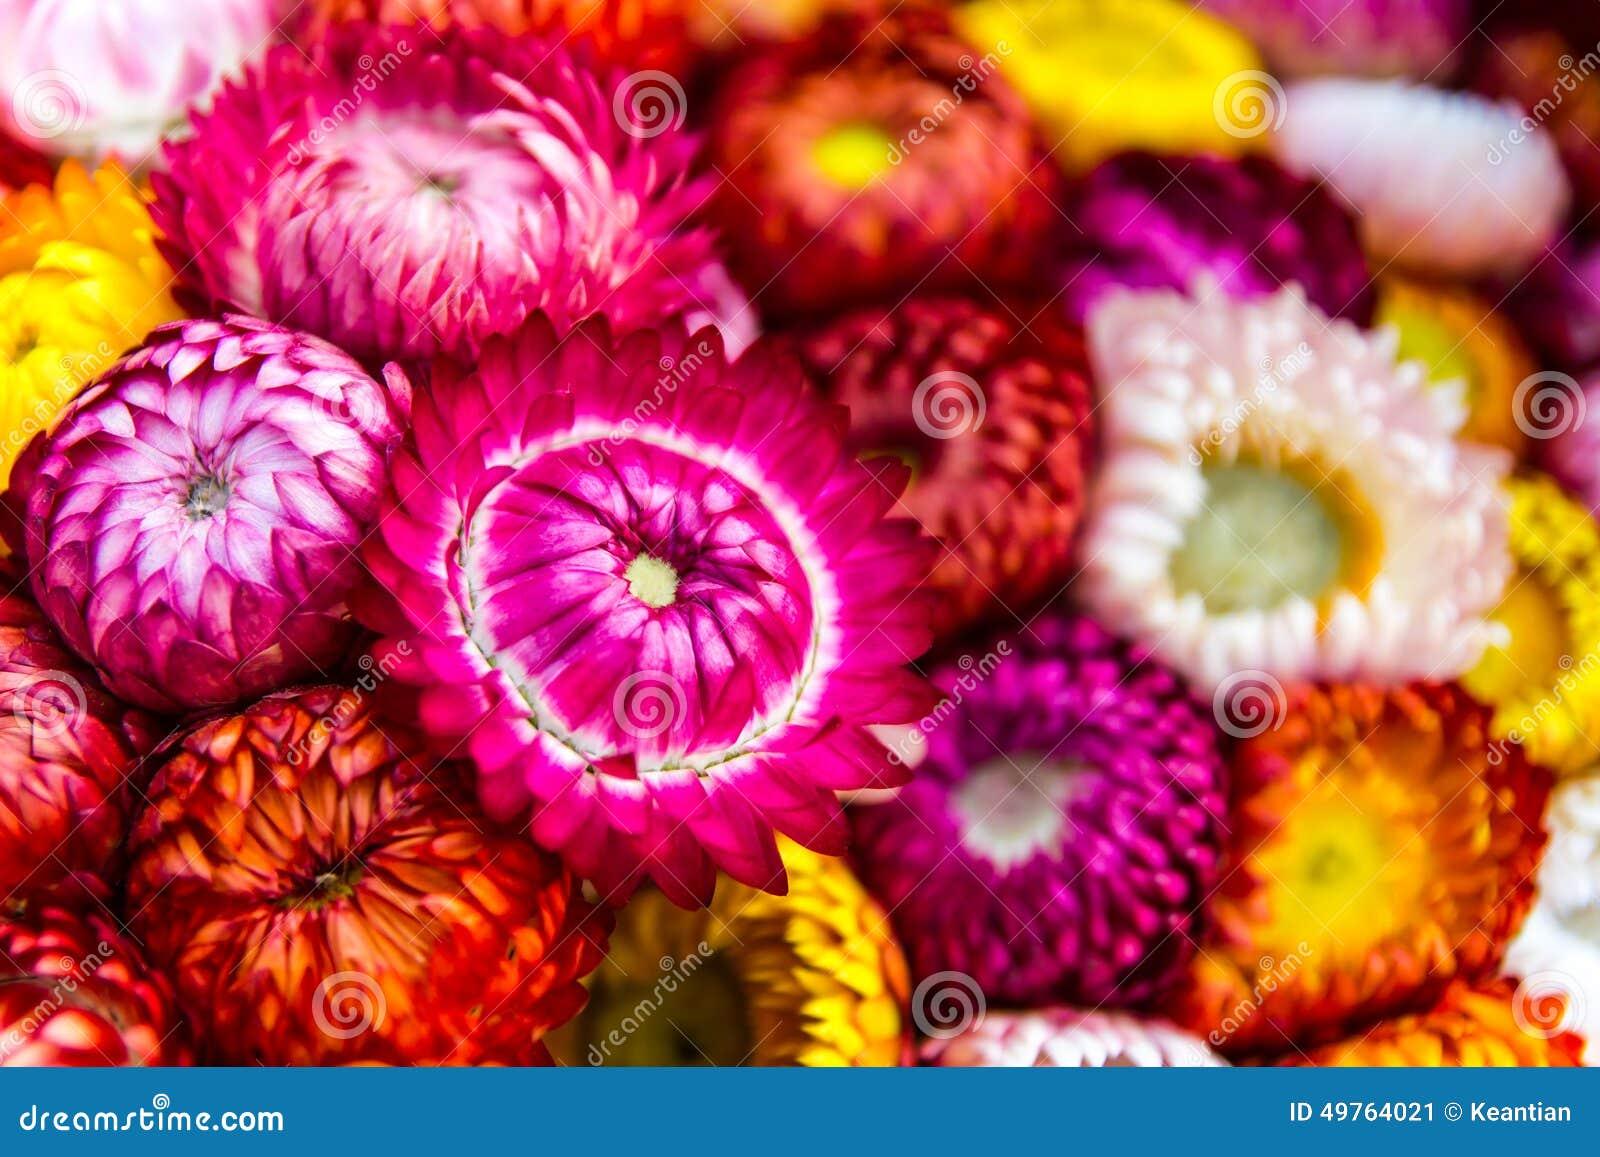 Download Everlasting pink stock image. Image of natural, detail - 49764021